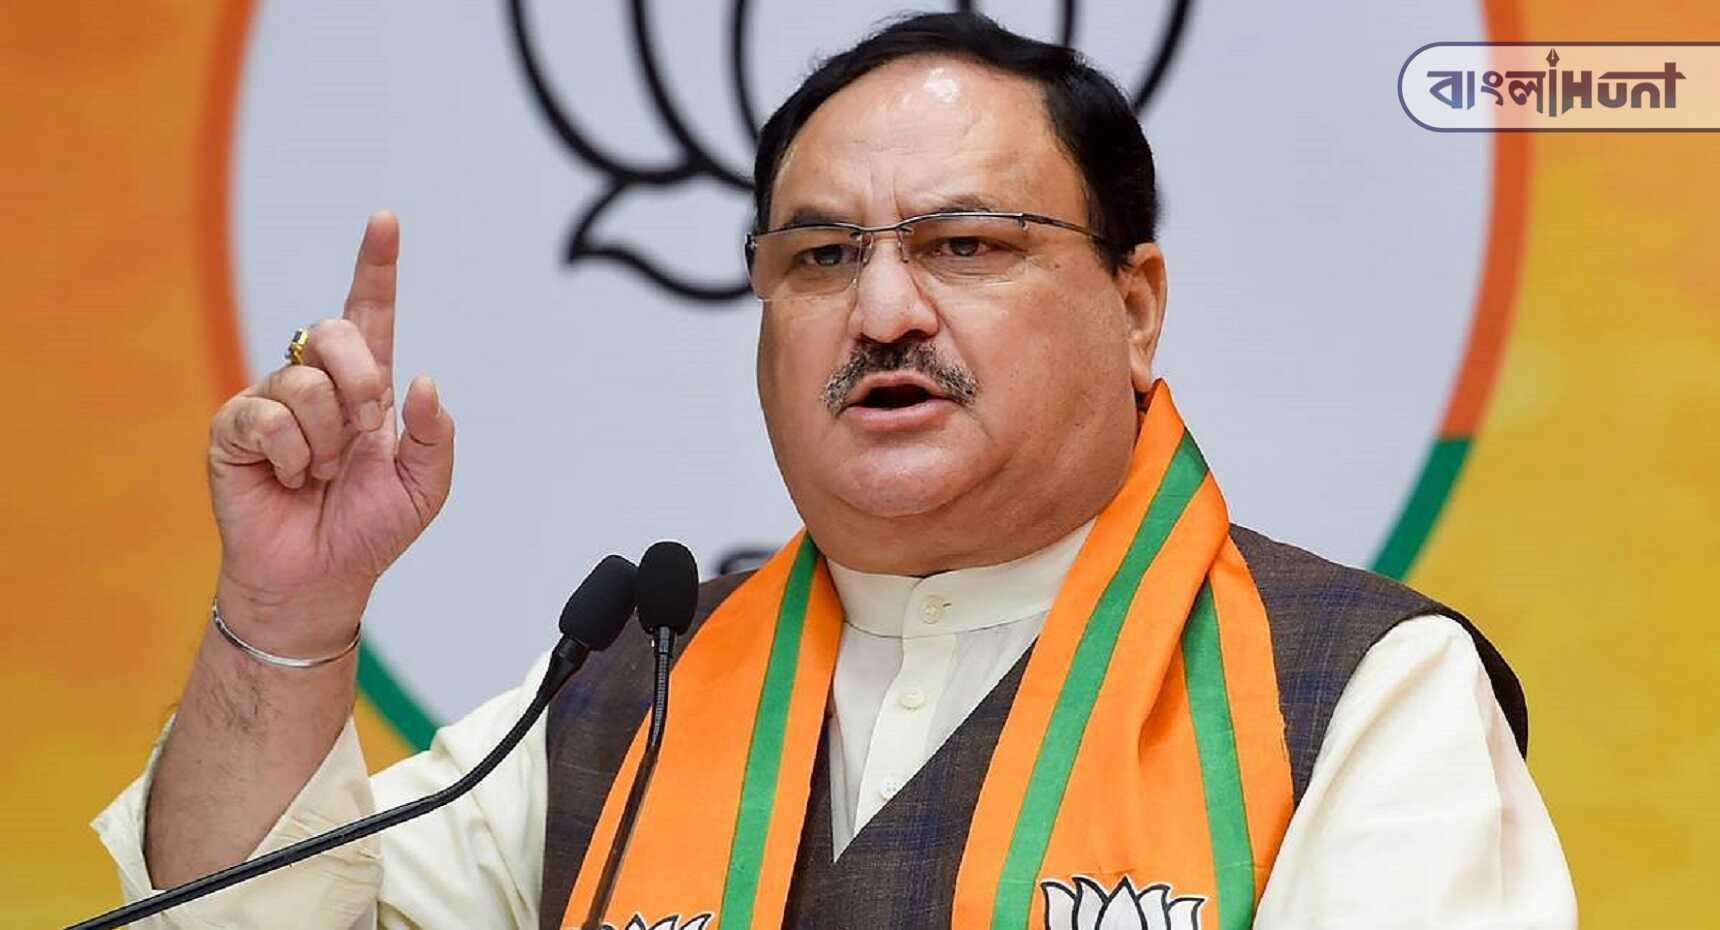 BJP will respond in a democratic way on tmc attacks: jp nadda